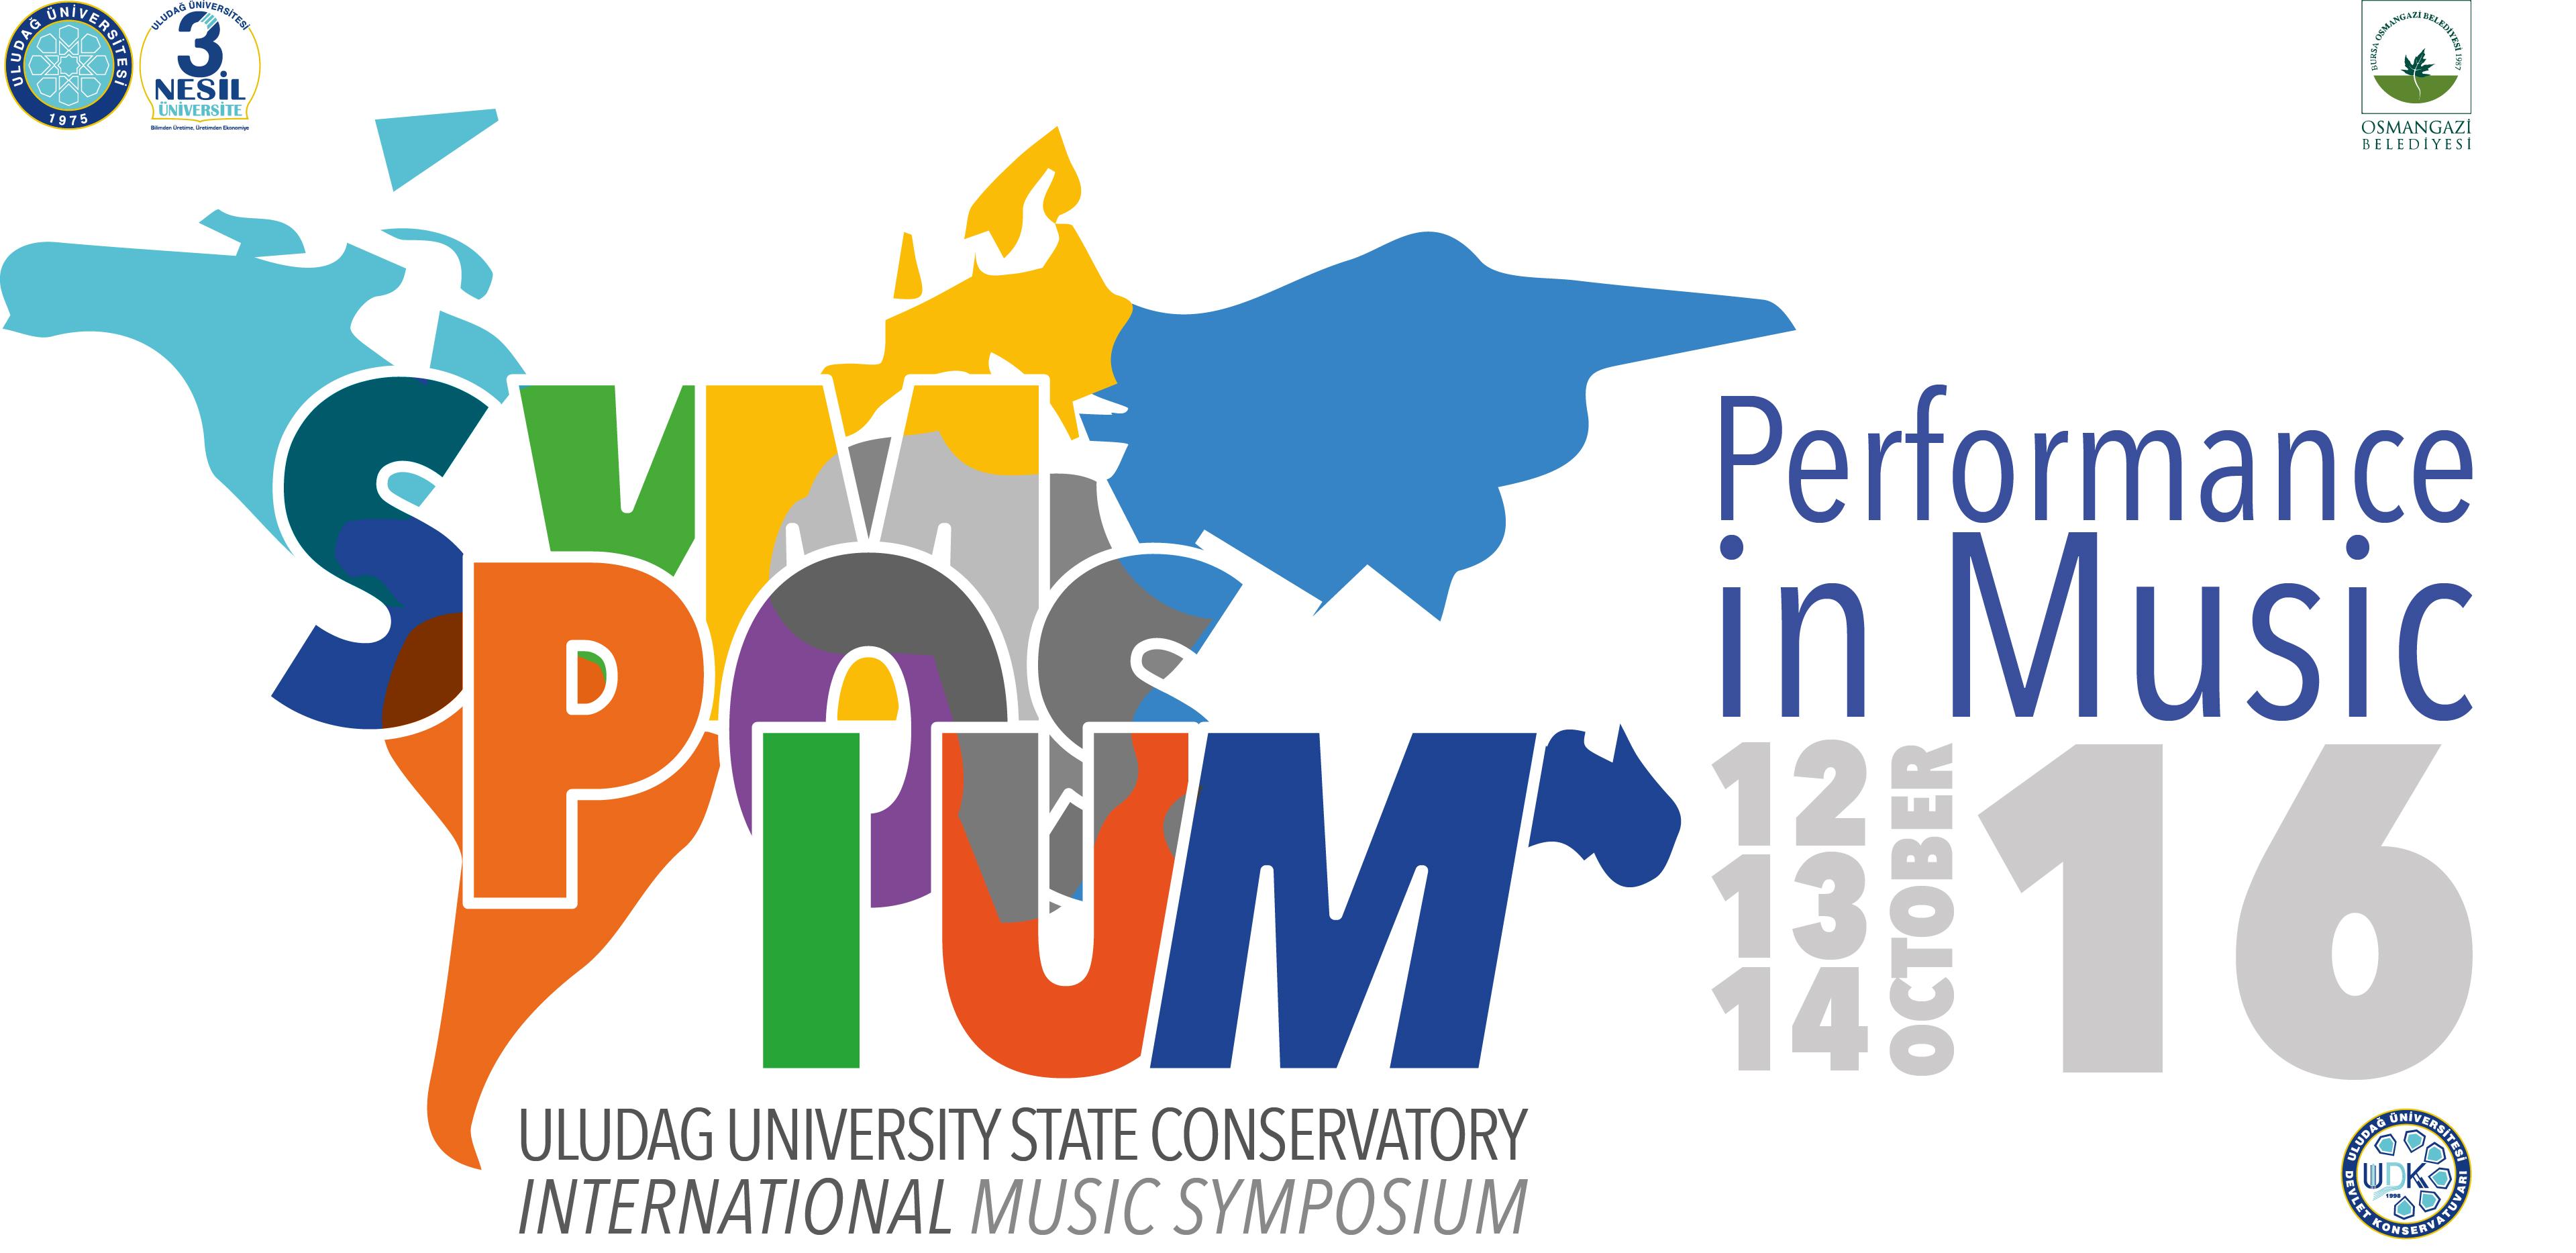 International Music Symposium